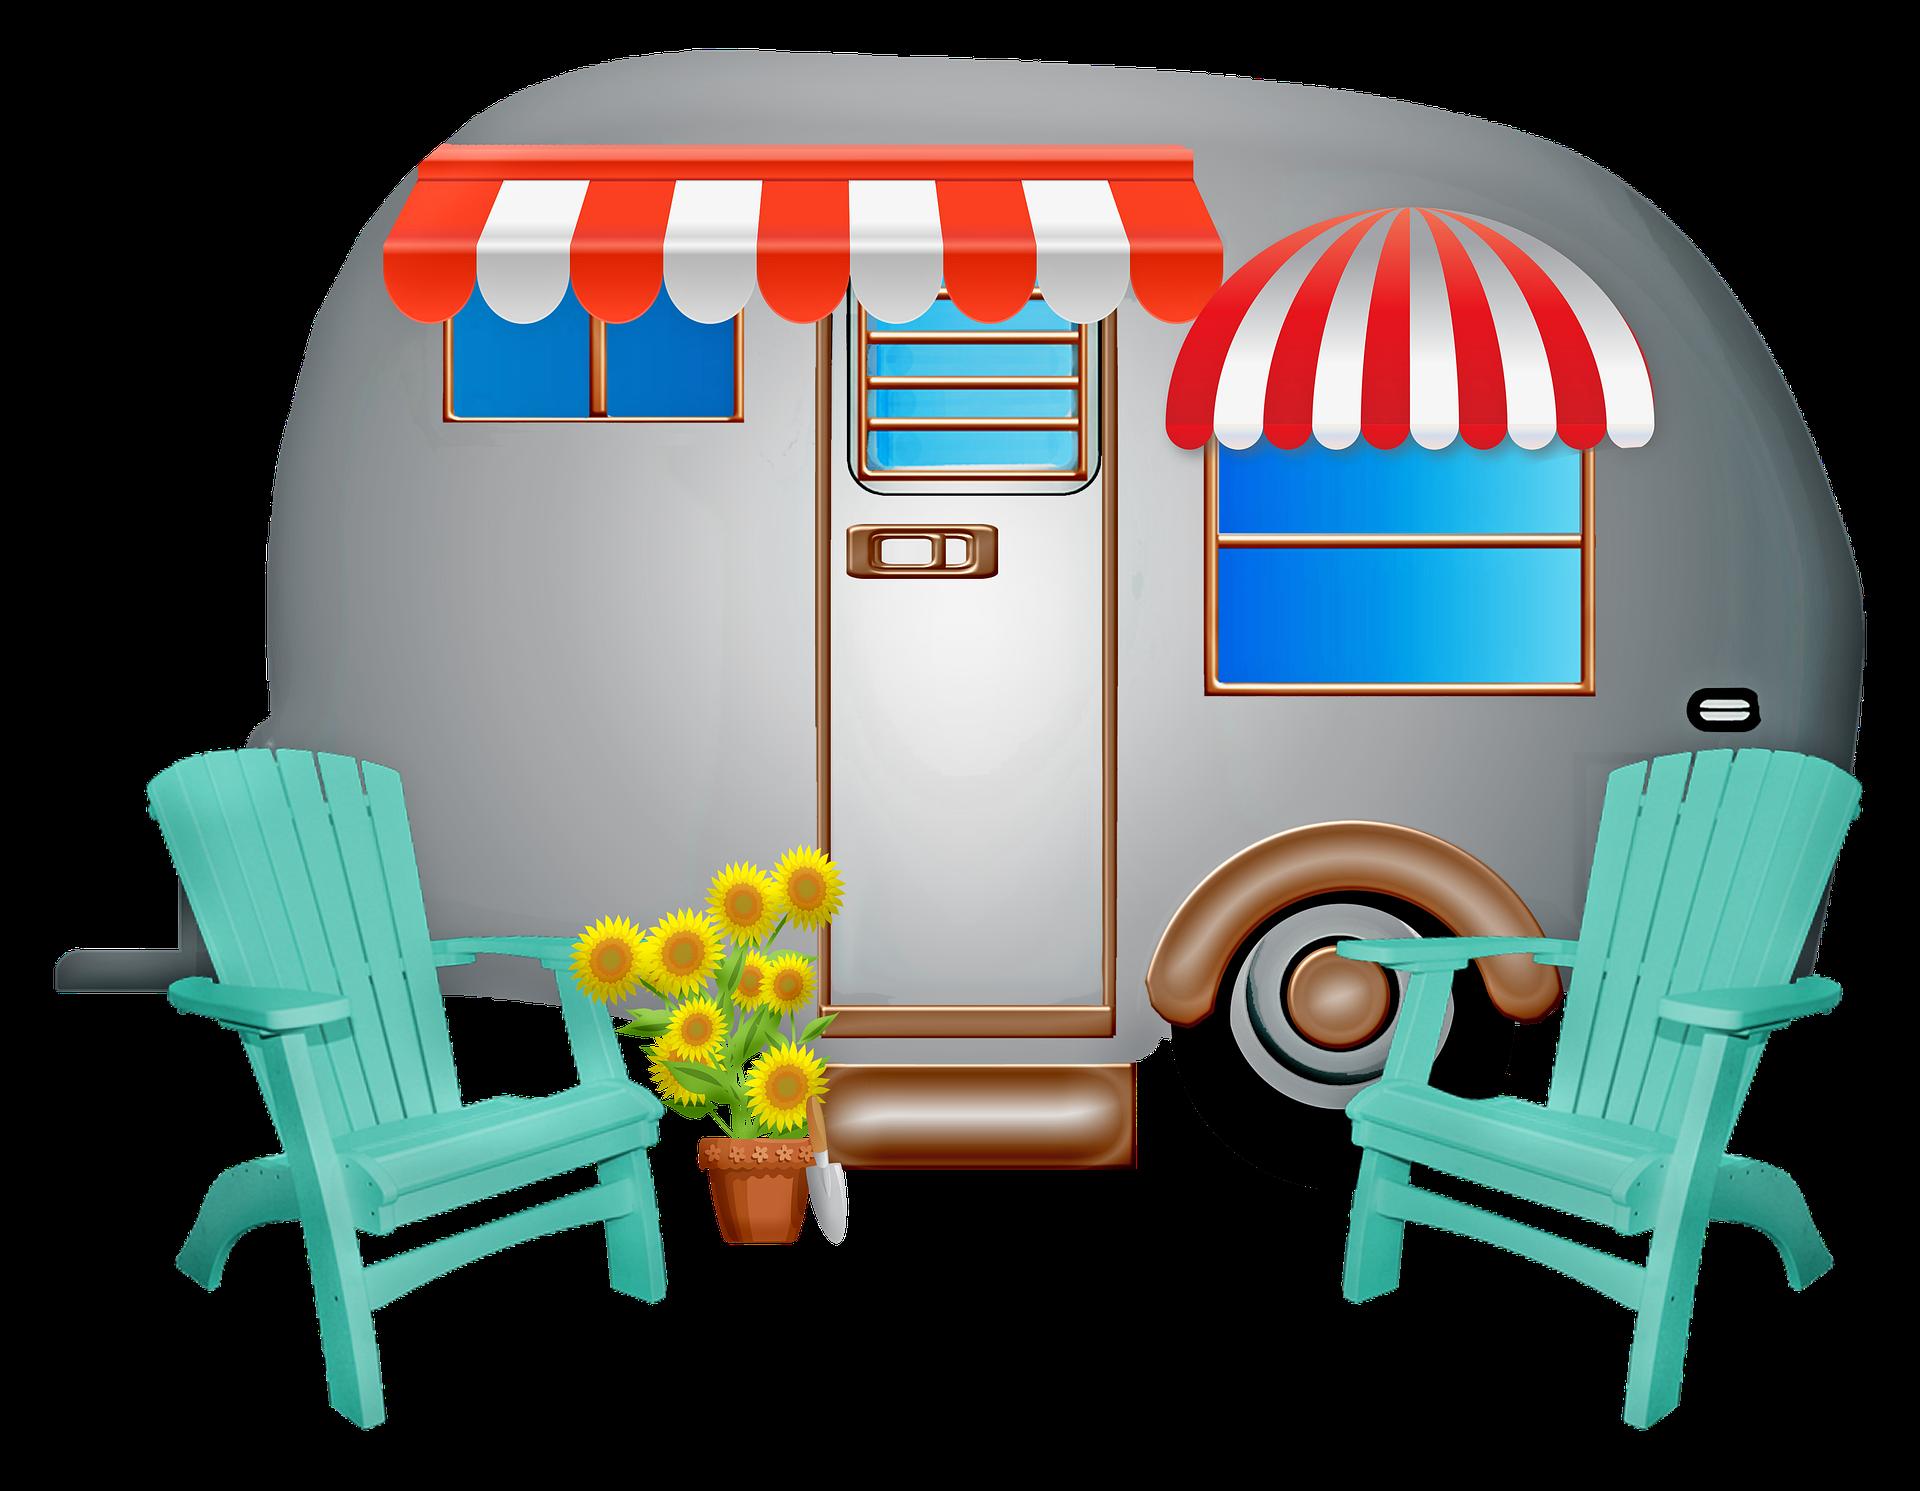 caravan-4305329_1920